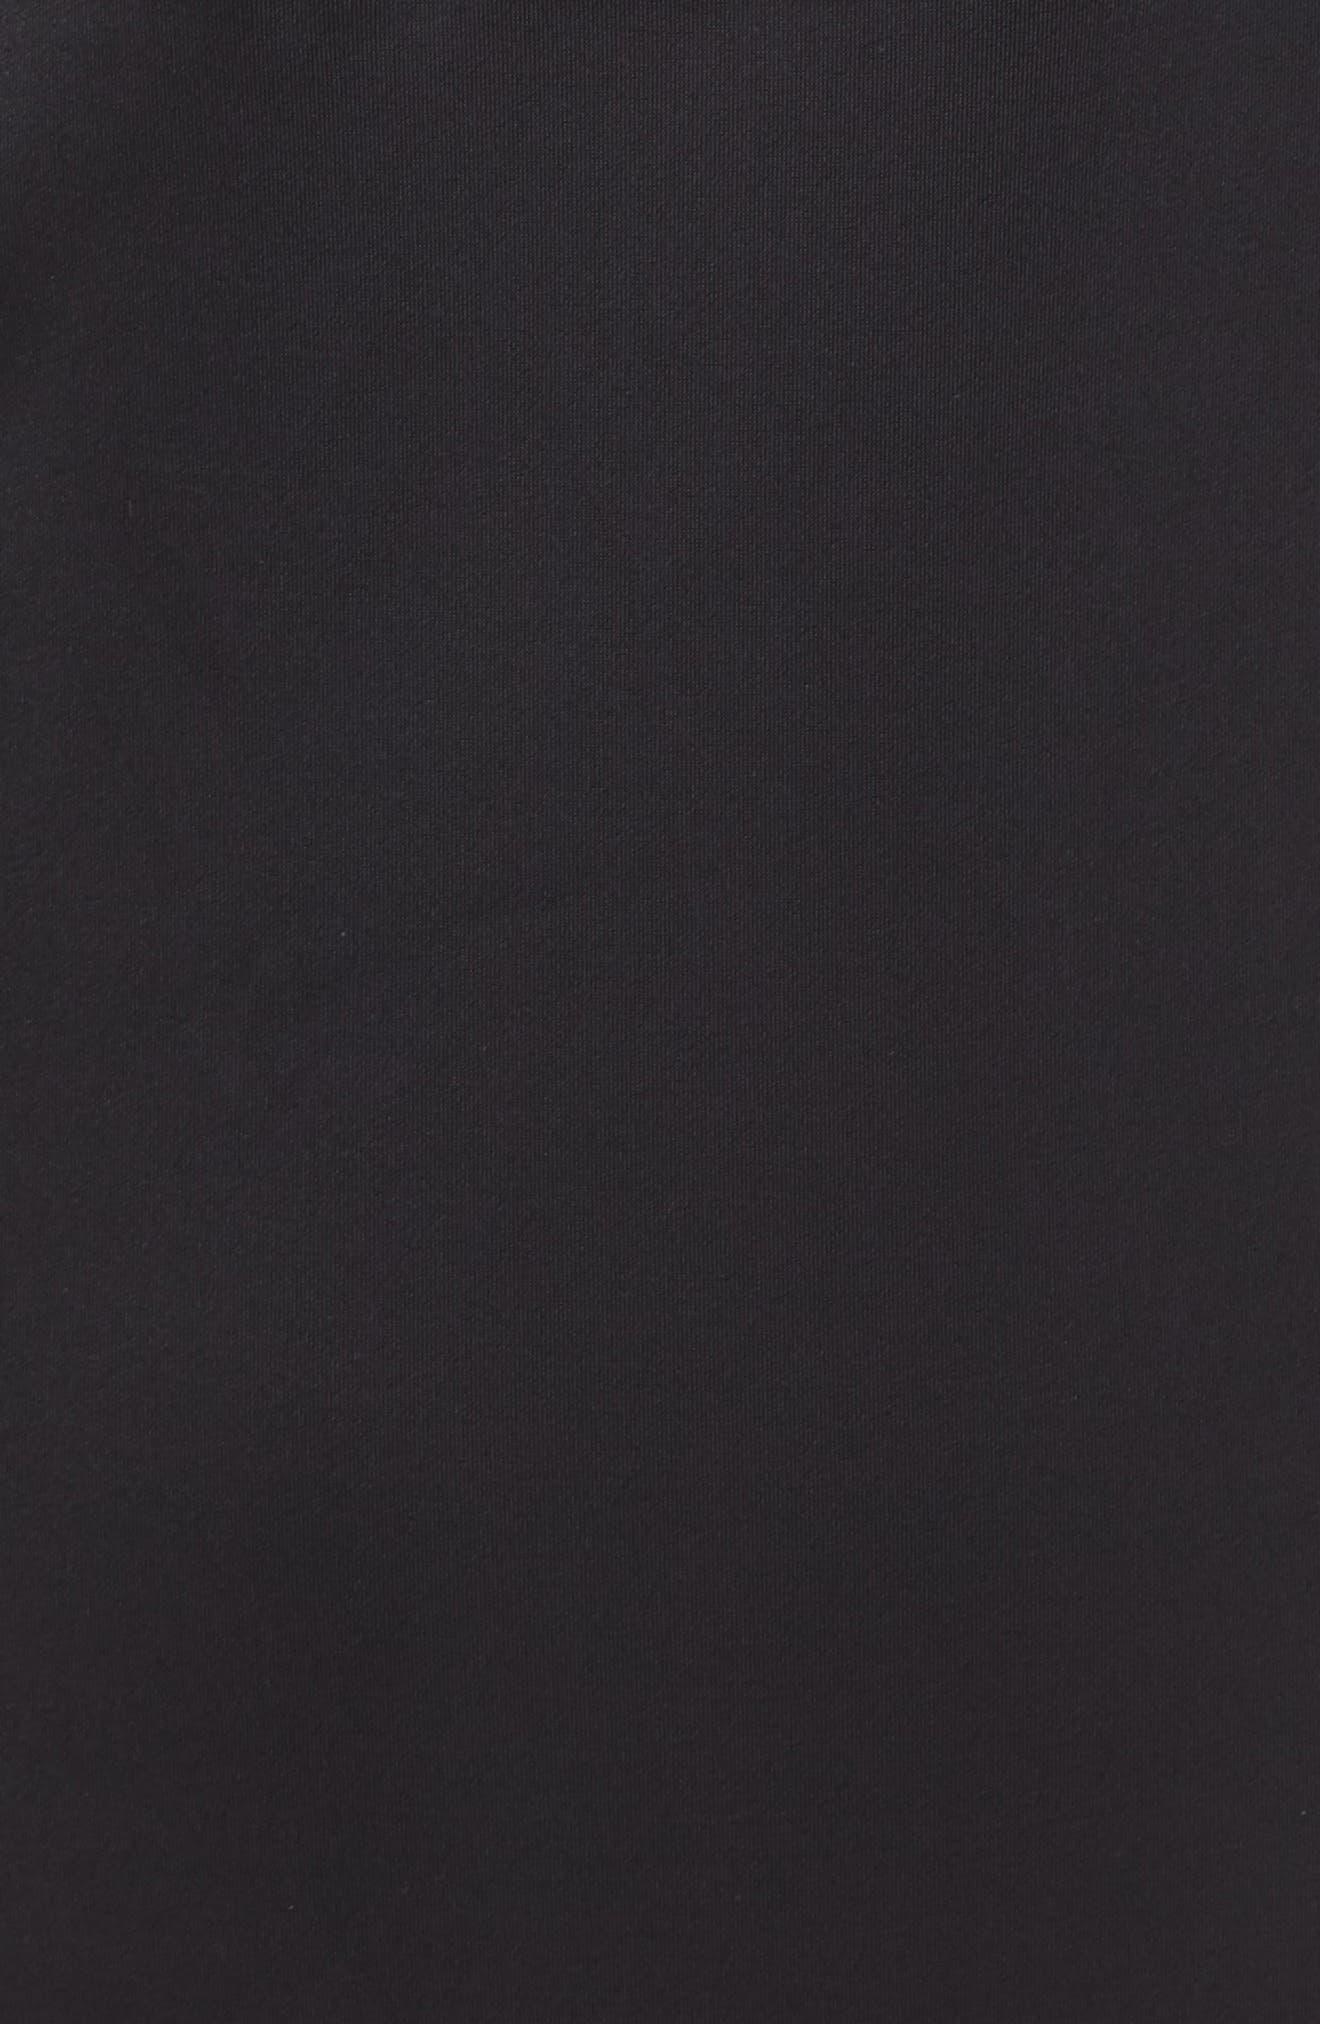 NORDSTROM LINGERIE, U-Plunge Backless Strapless Underwire Bodysuit, Alternate thumbnail 7, color, BLACK